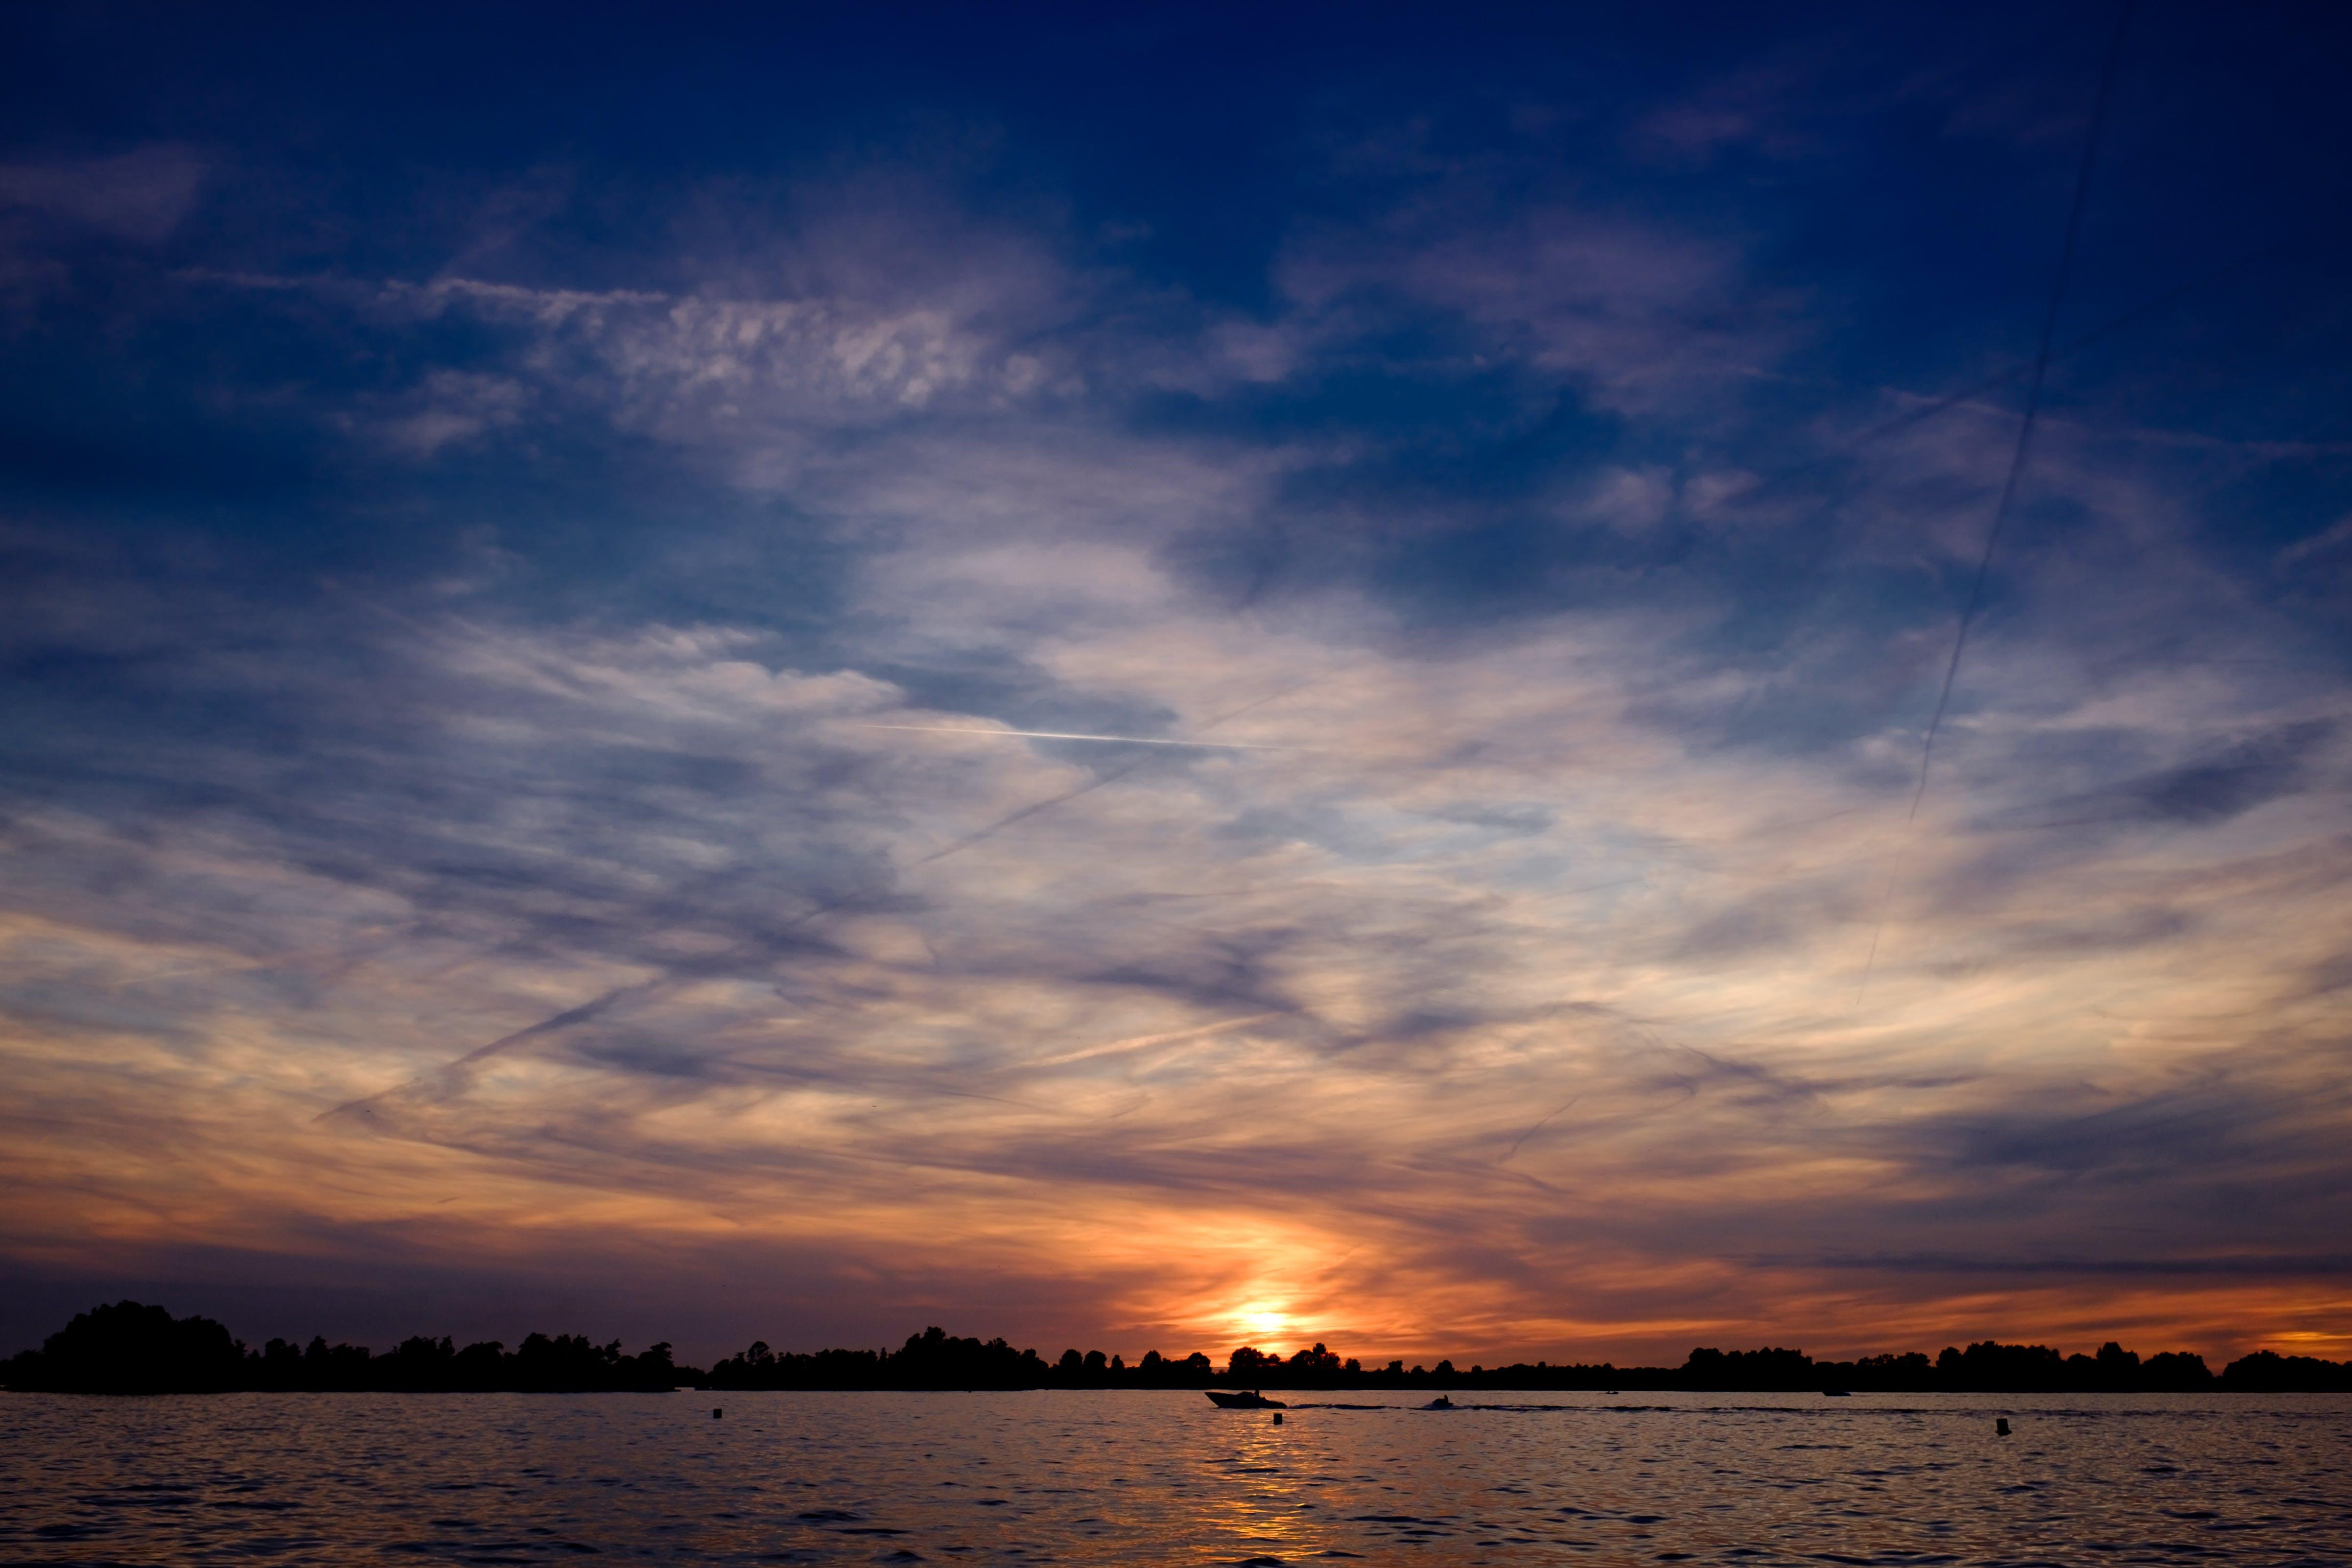 Kostenloses Stock Foto zu abend, himmel, see, sonnenaufgang